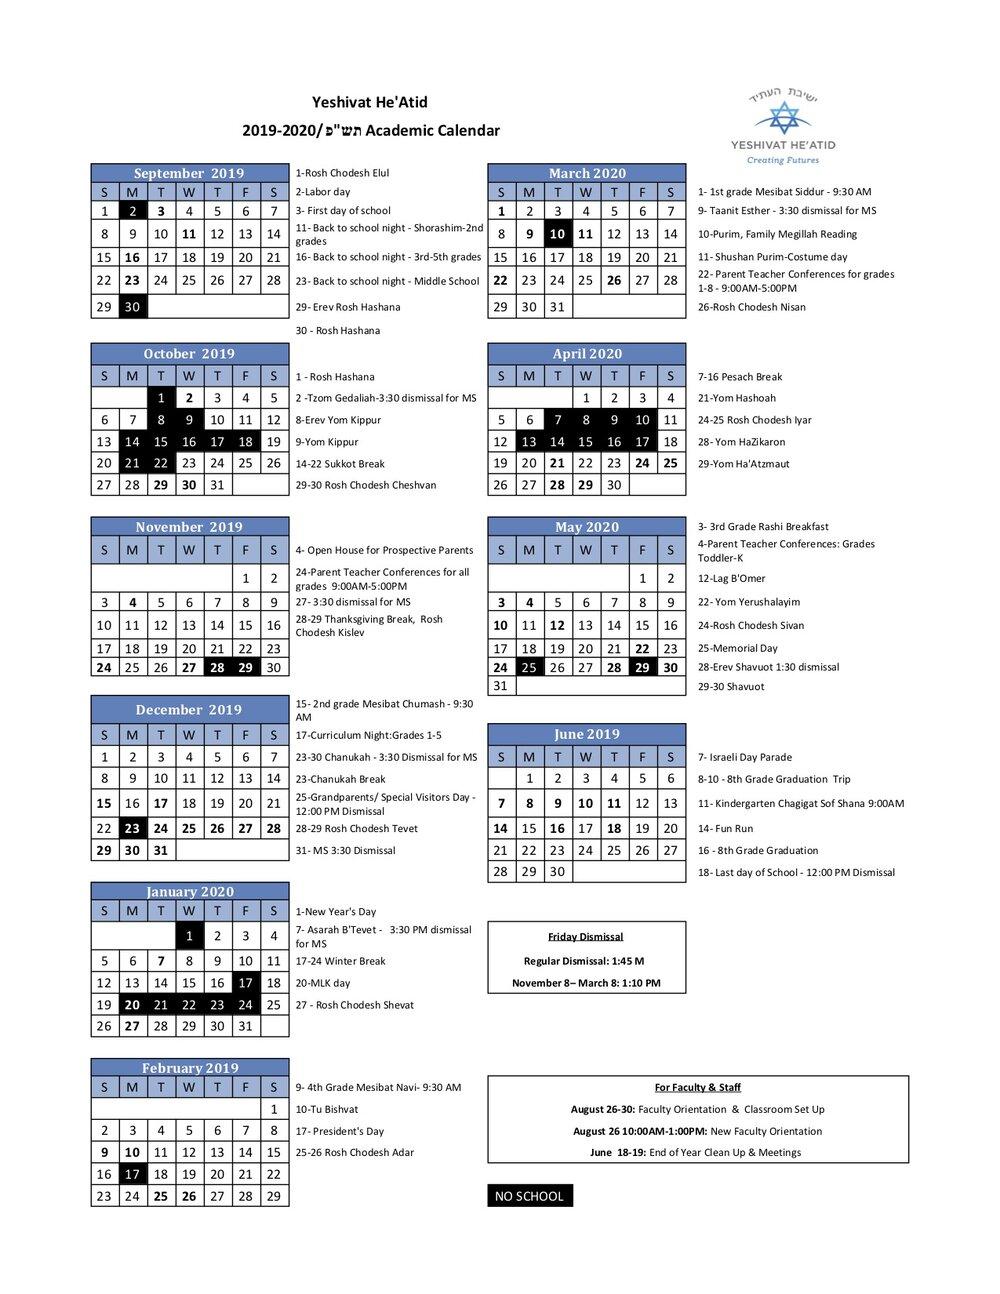 School Calendar — Yeshivat He'atid Pertaining To Naugatuck Valley Community College Calendar